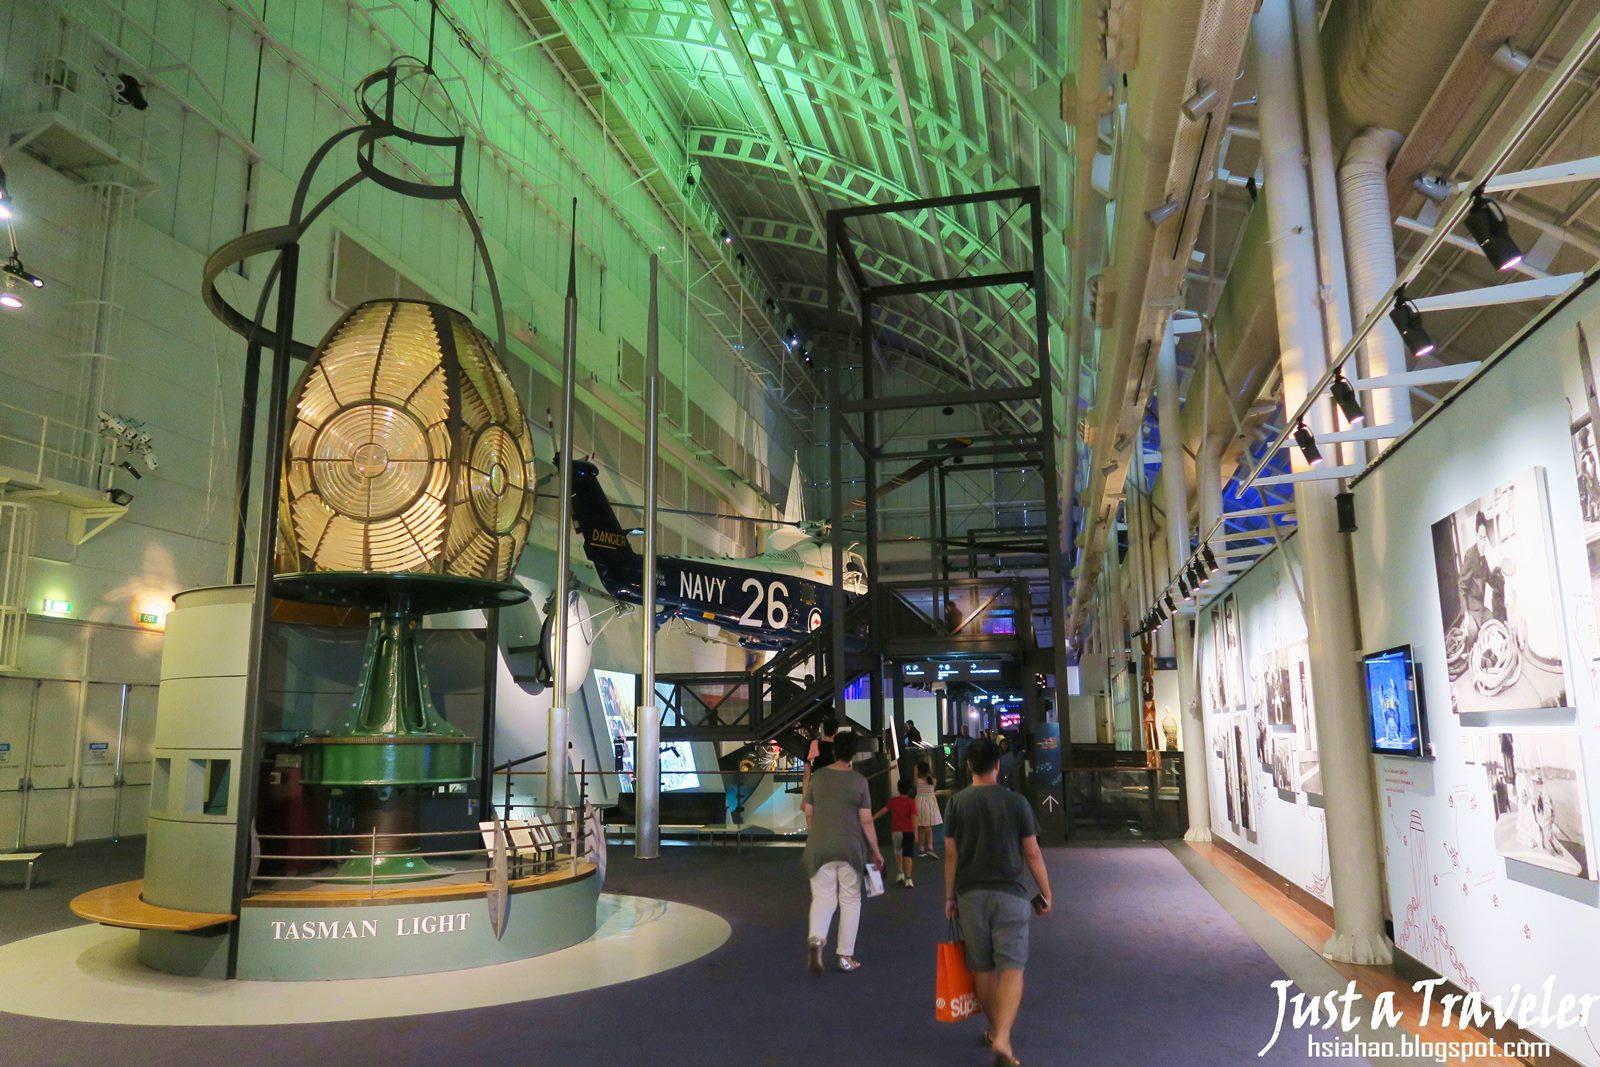 雪梨-景點-推薦-達令港-自由行-行程-旅遊-澳洲-澳洲國立海事博物館-Australian National Maritime Museum-Darling-Harbour-Tourist-Attraction-Travel